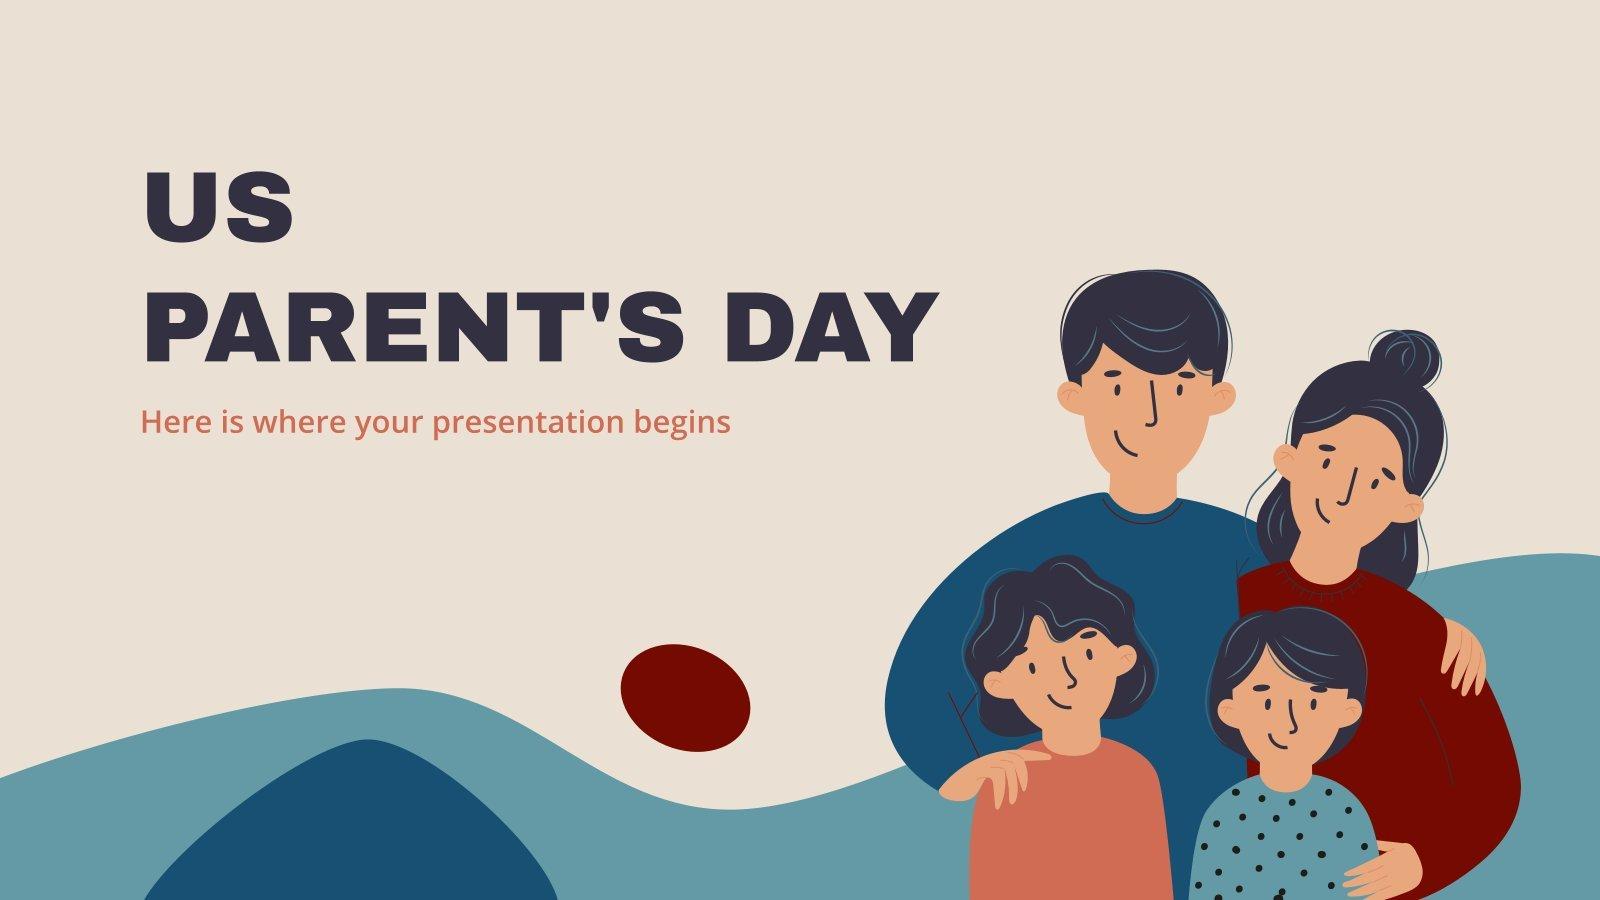 US Parent's Day presentation template